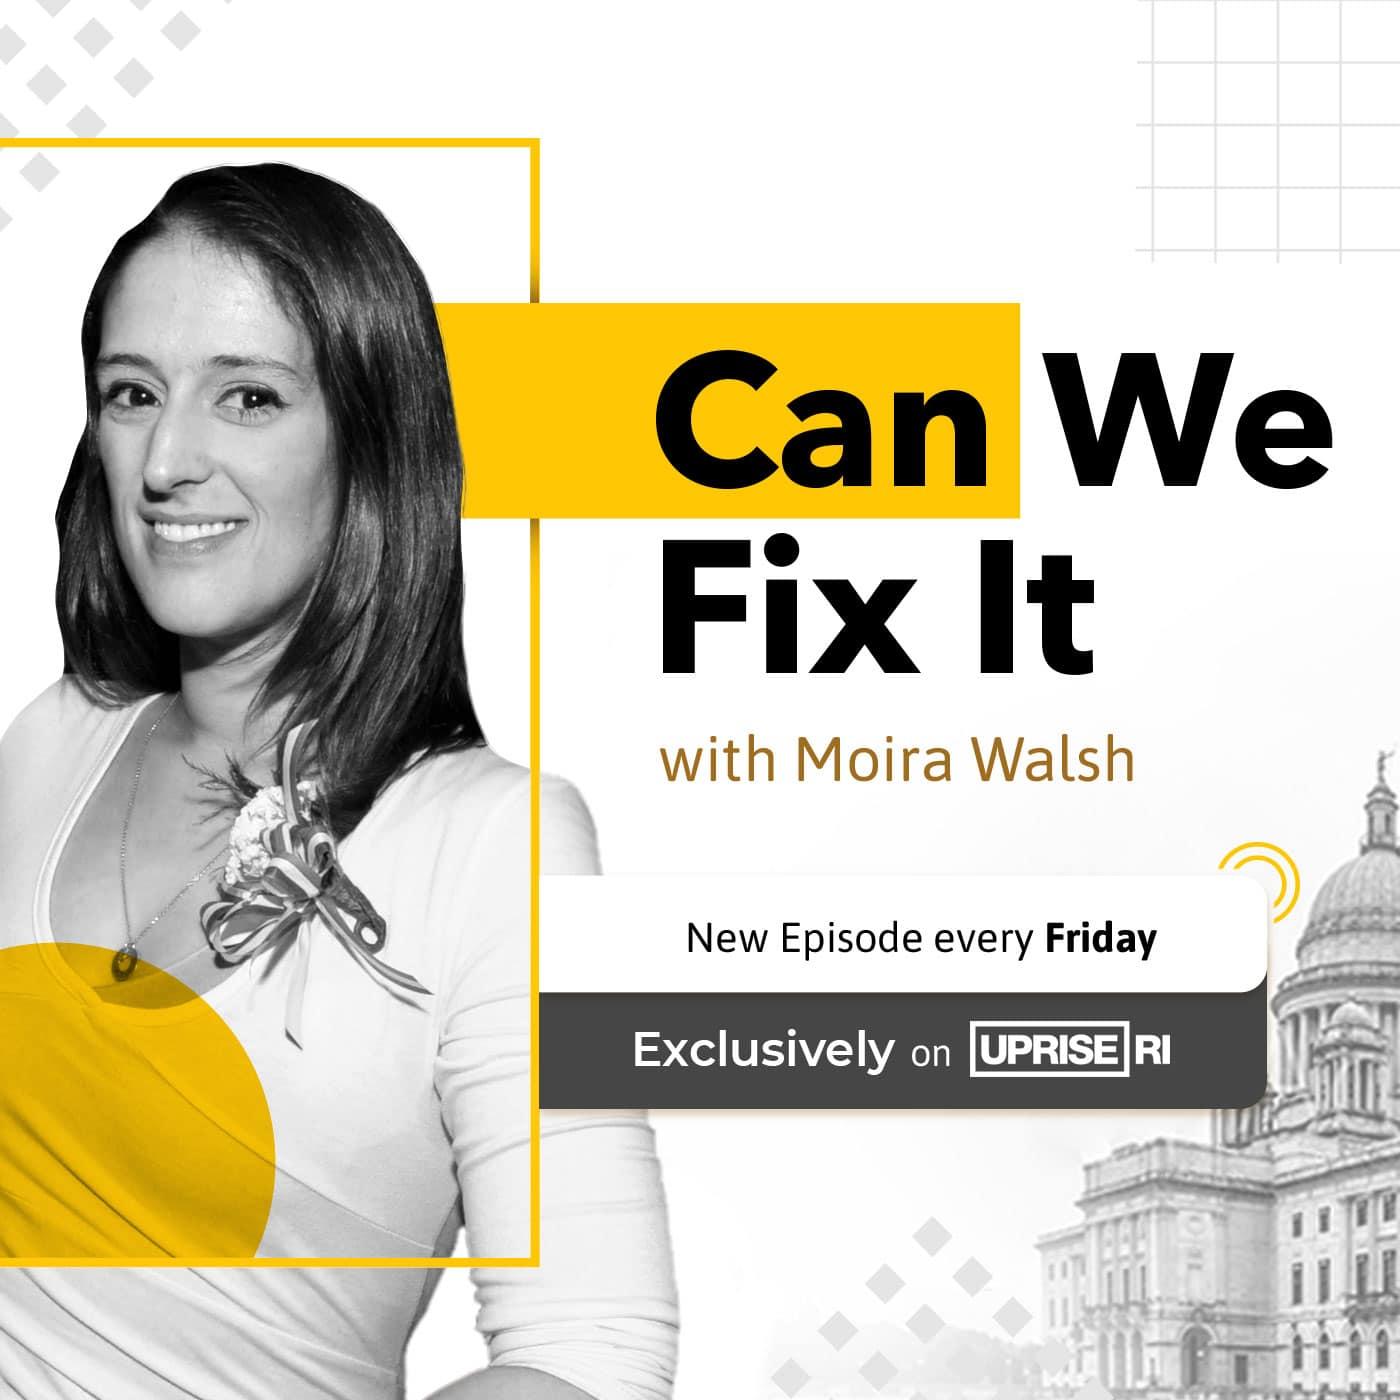 Can We Fix It w/Moira Wlash